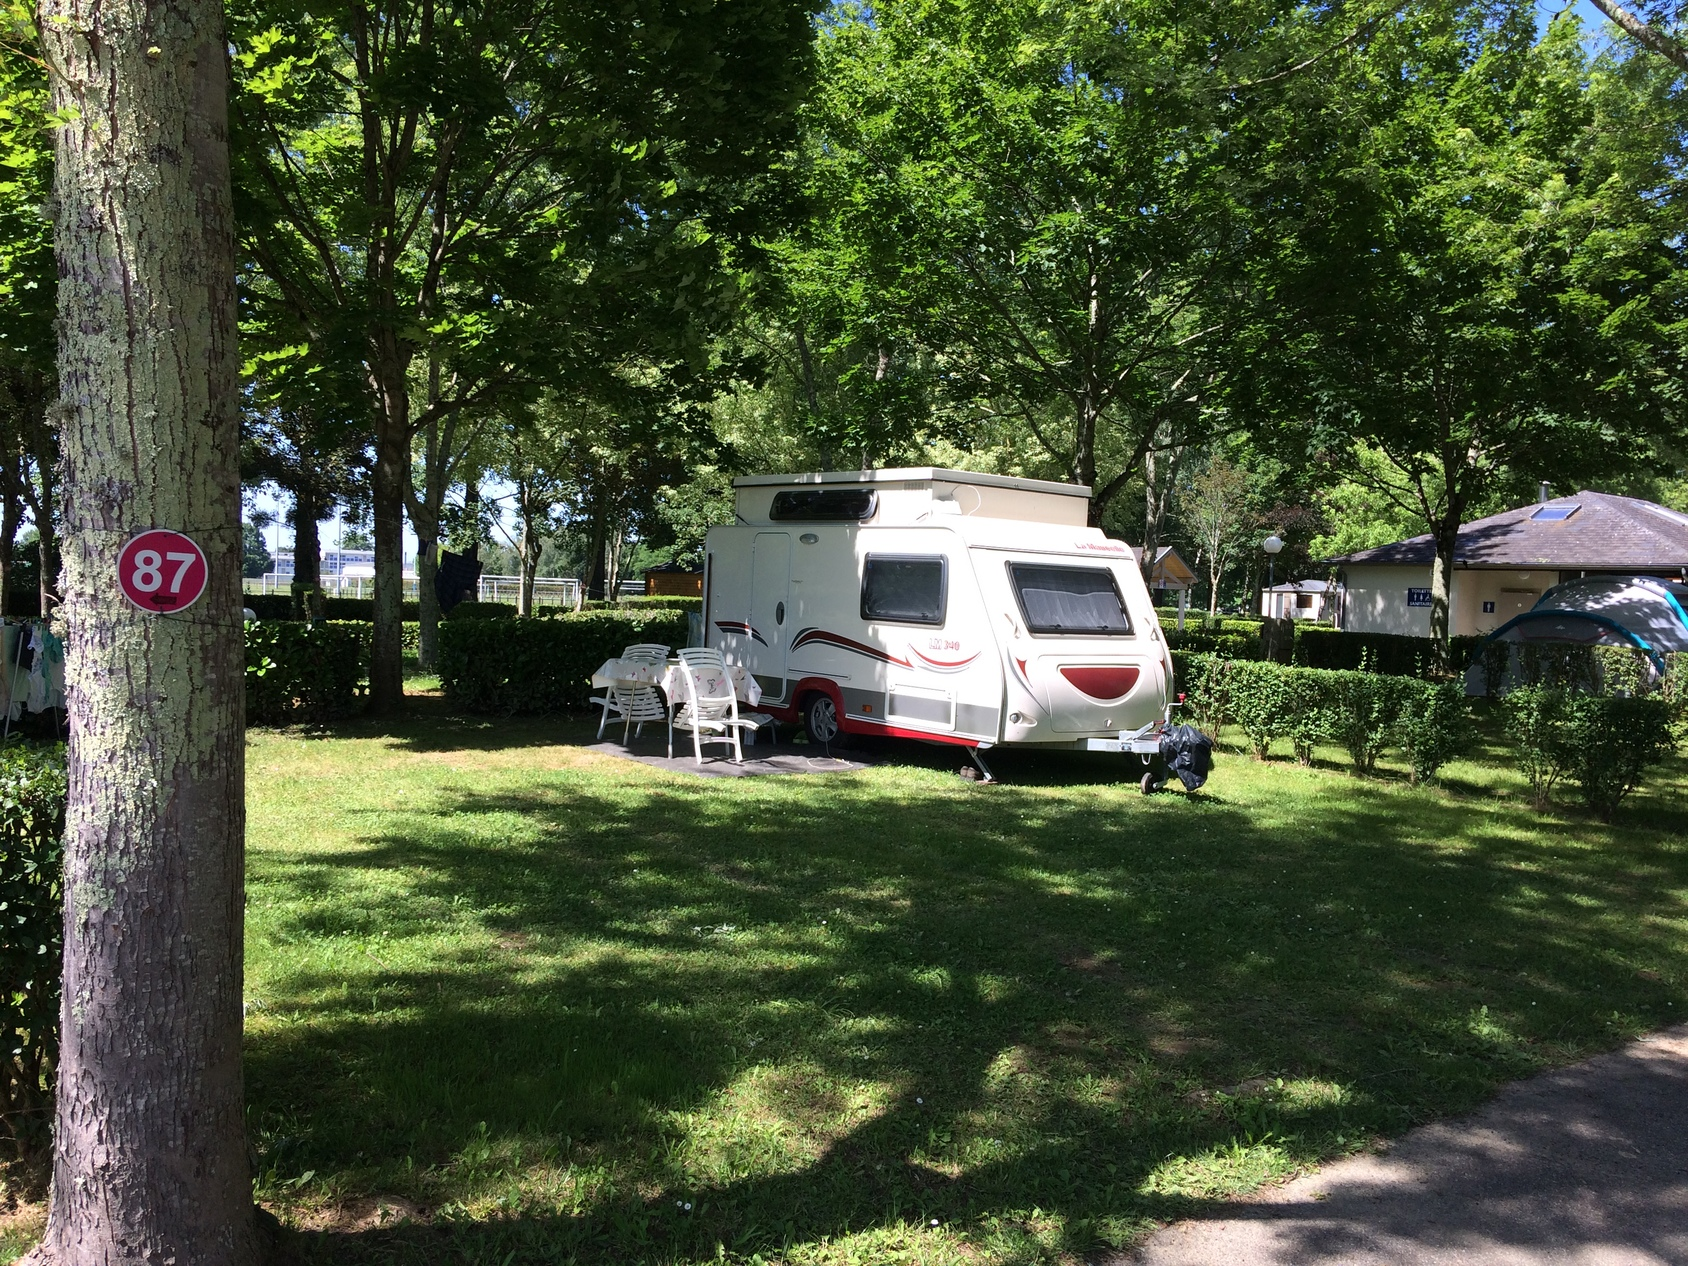 Frankrijk-OloronSainteMarie-Camping%20Pyrenees%20Nature-ExtraLarge Wintersport Frankrijk|Pagina 2 van 55